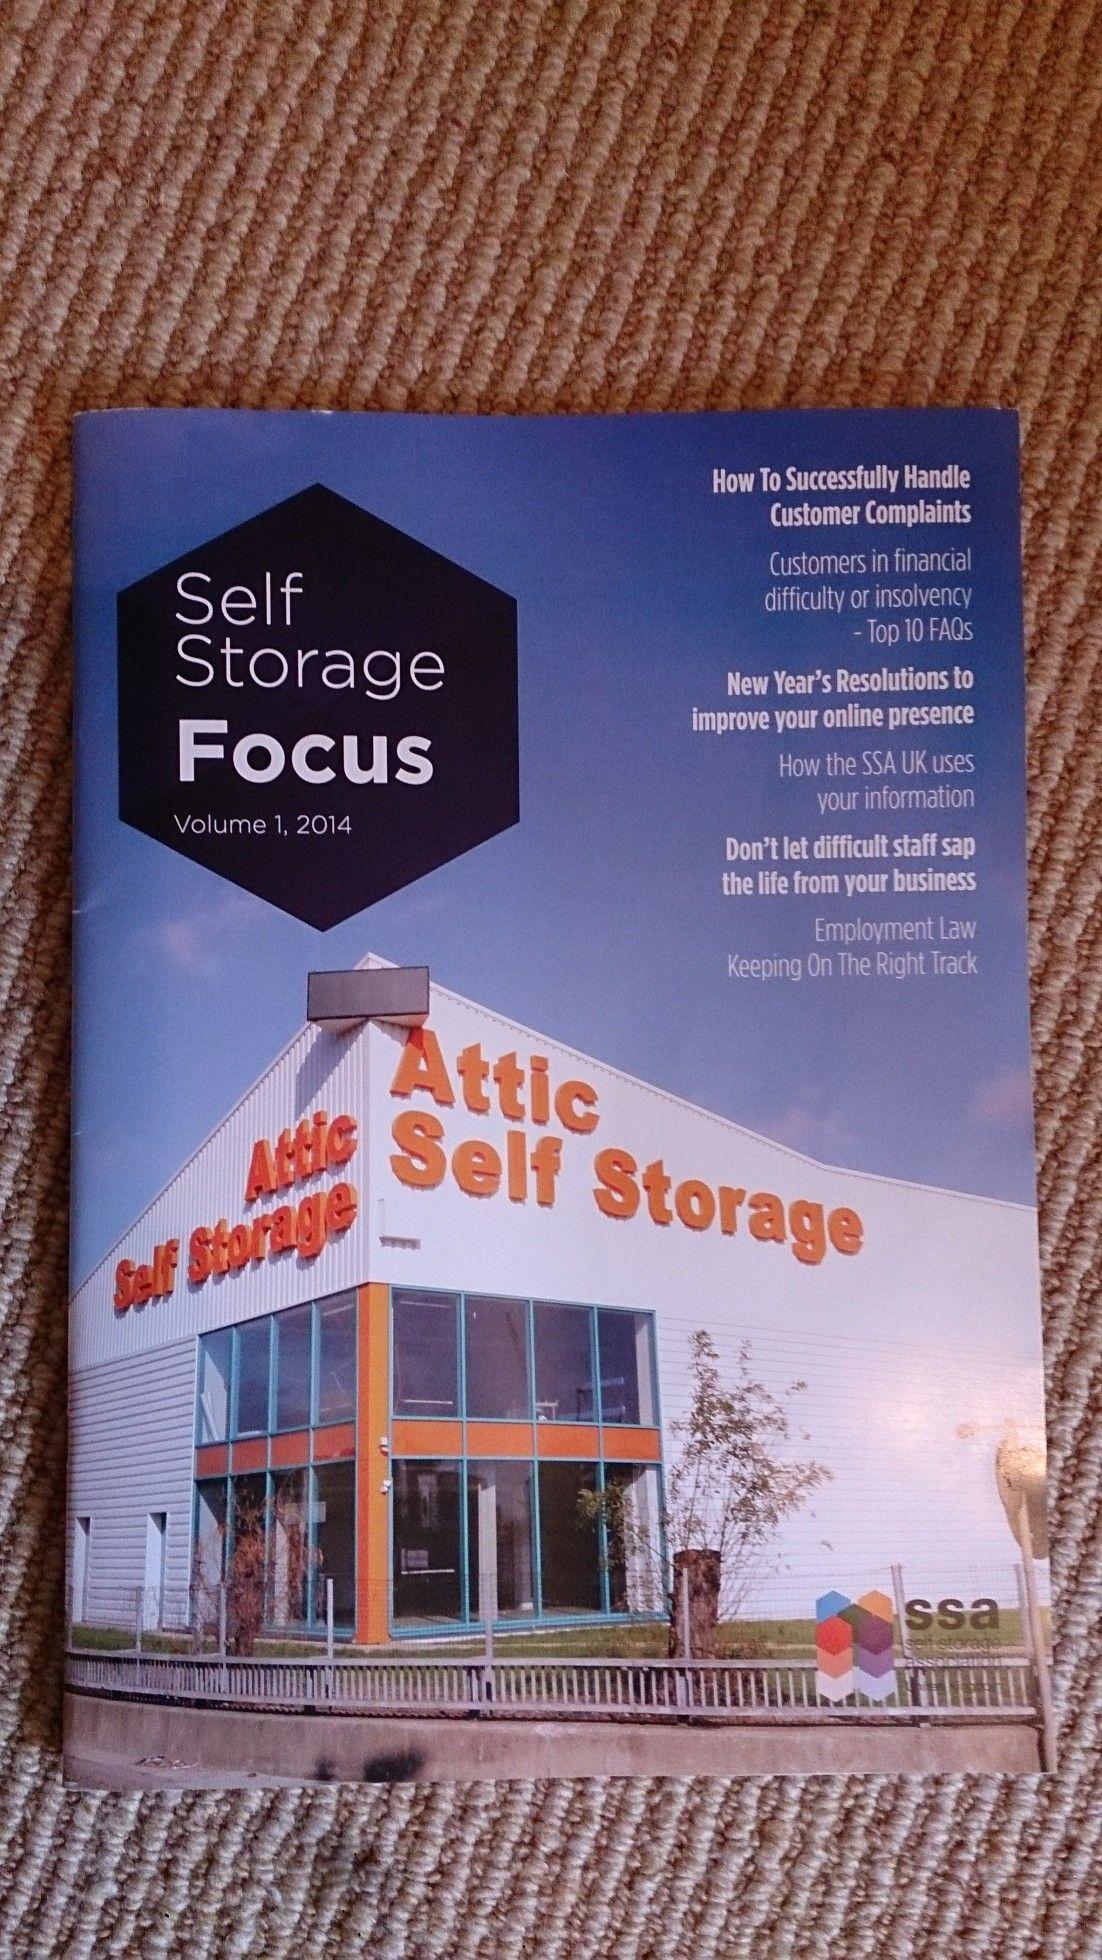 My Attic Self Storage